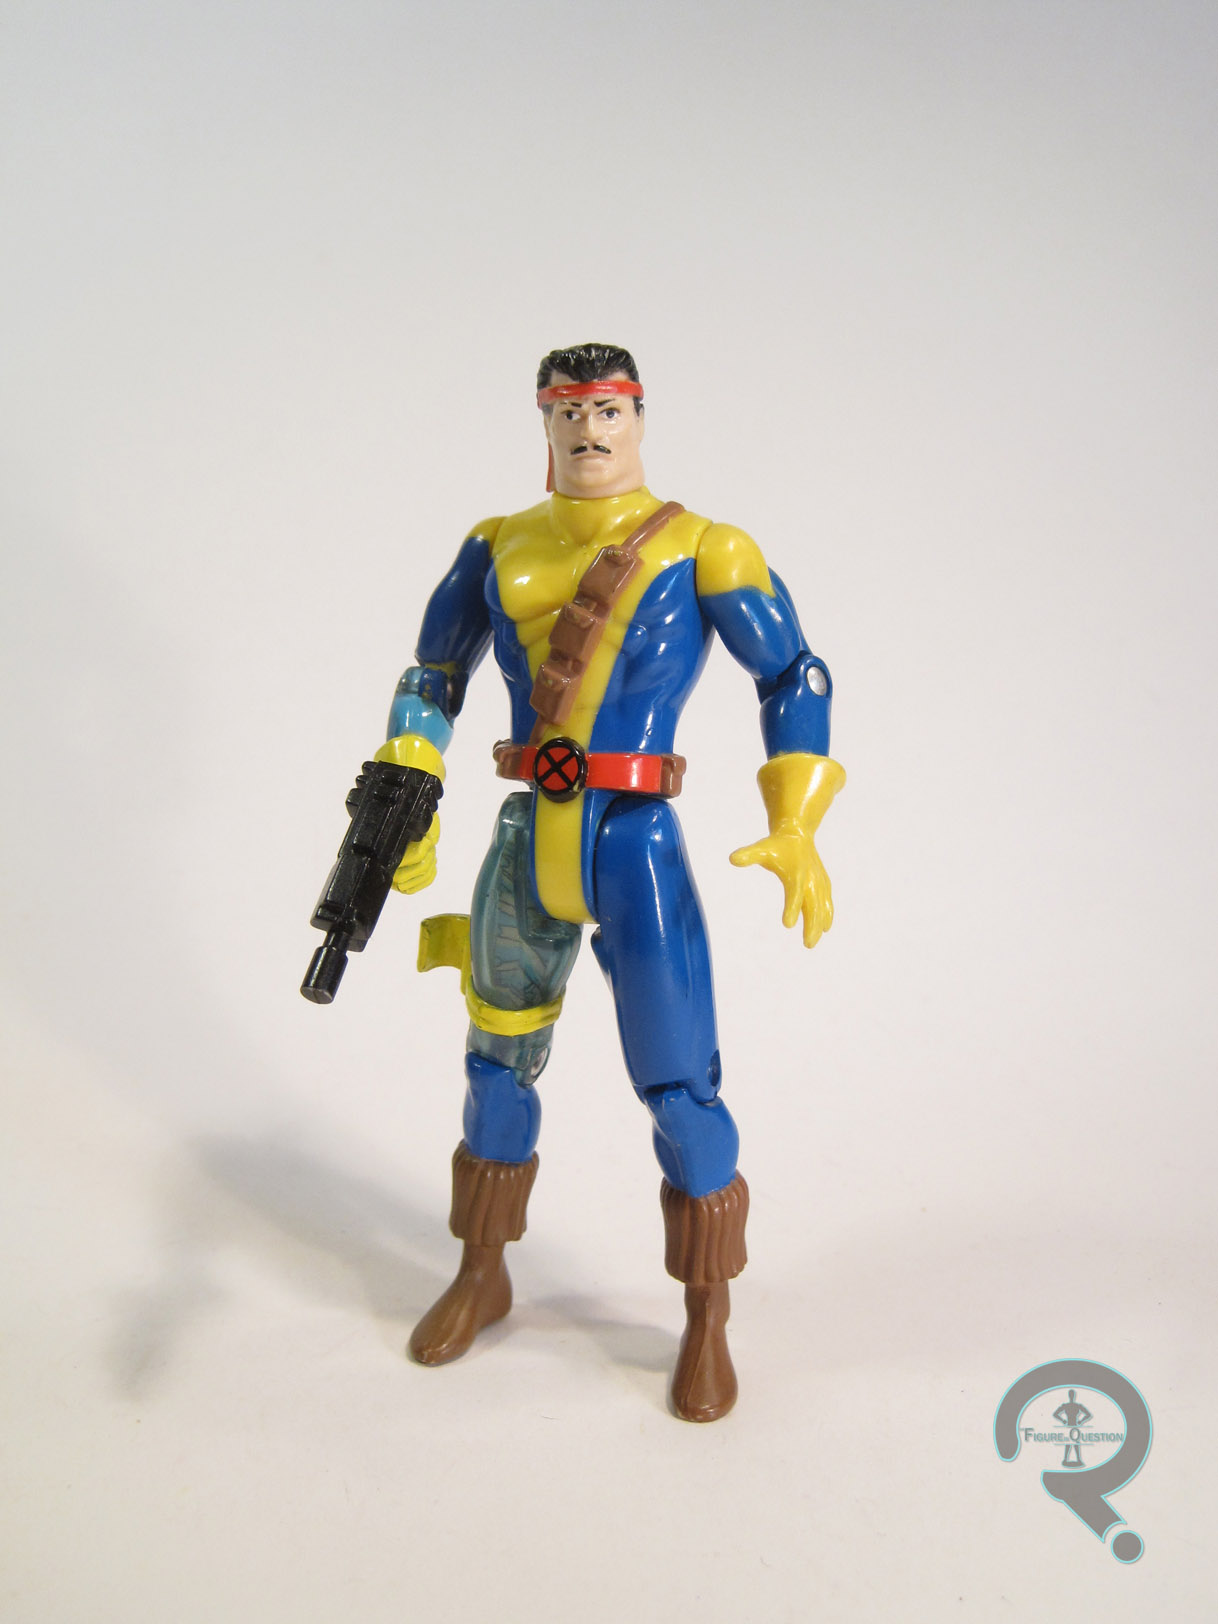 X-Men Weapon Magneto Helmet 1992 TOY BIZ Marvel Original Figure Accessory